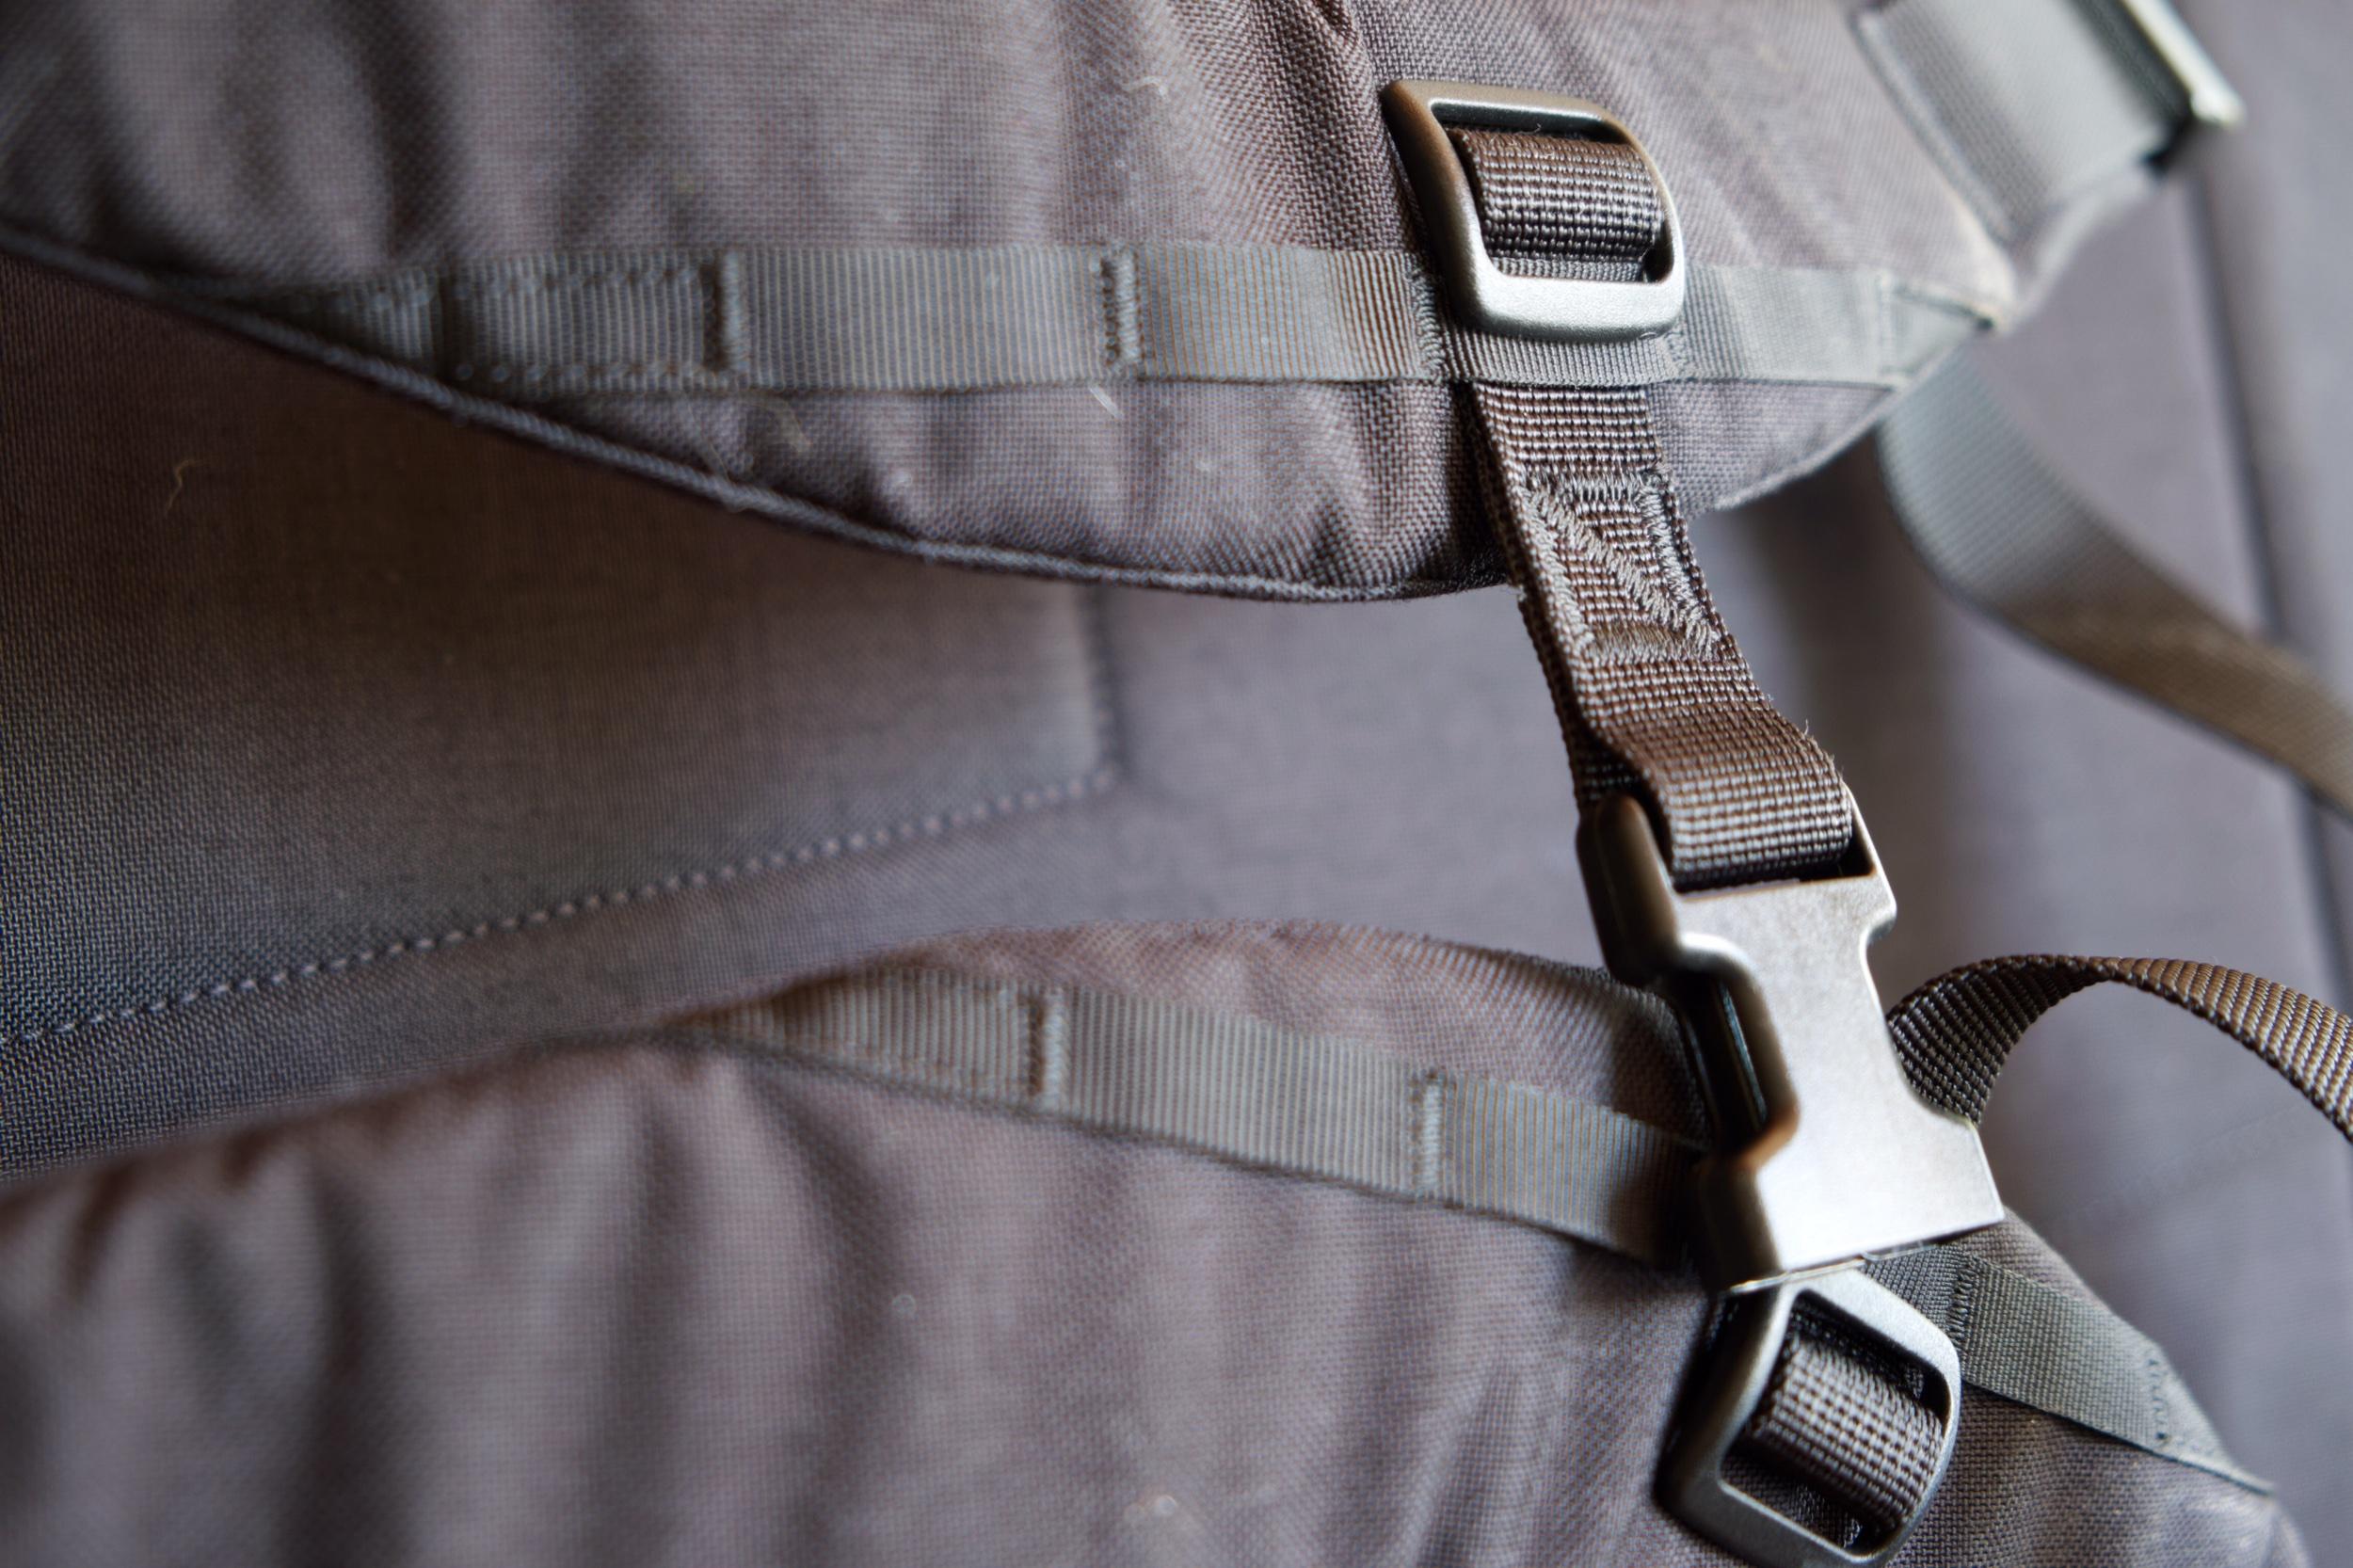 Subtle branding on the sternum strap.